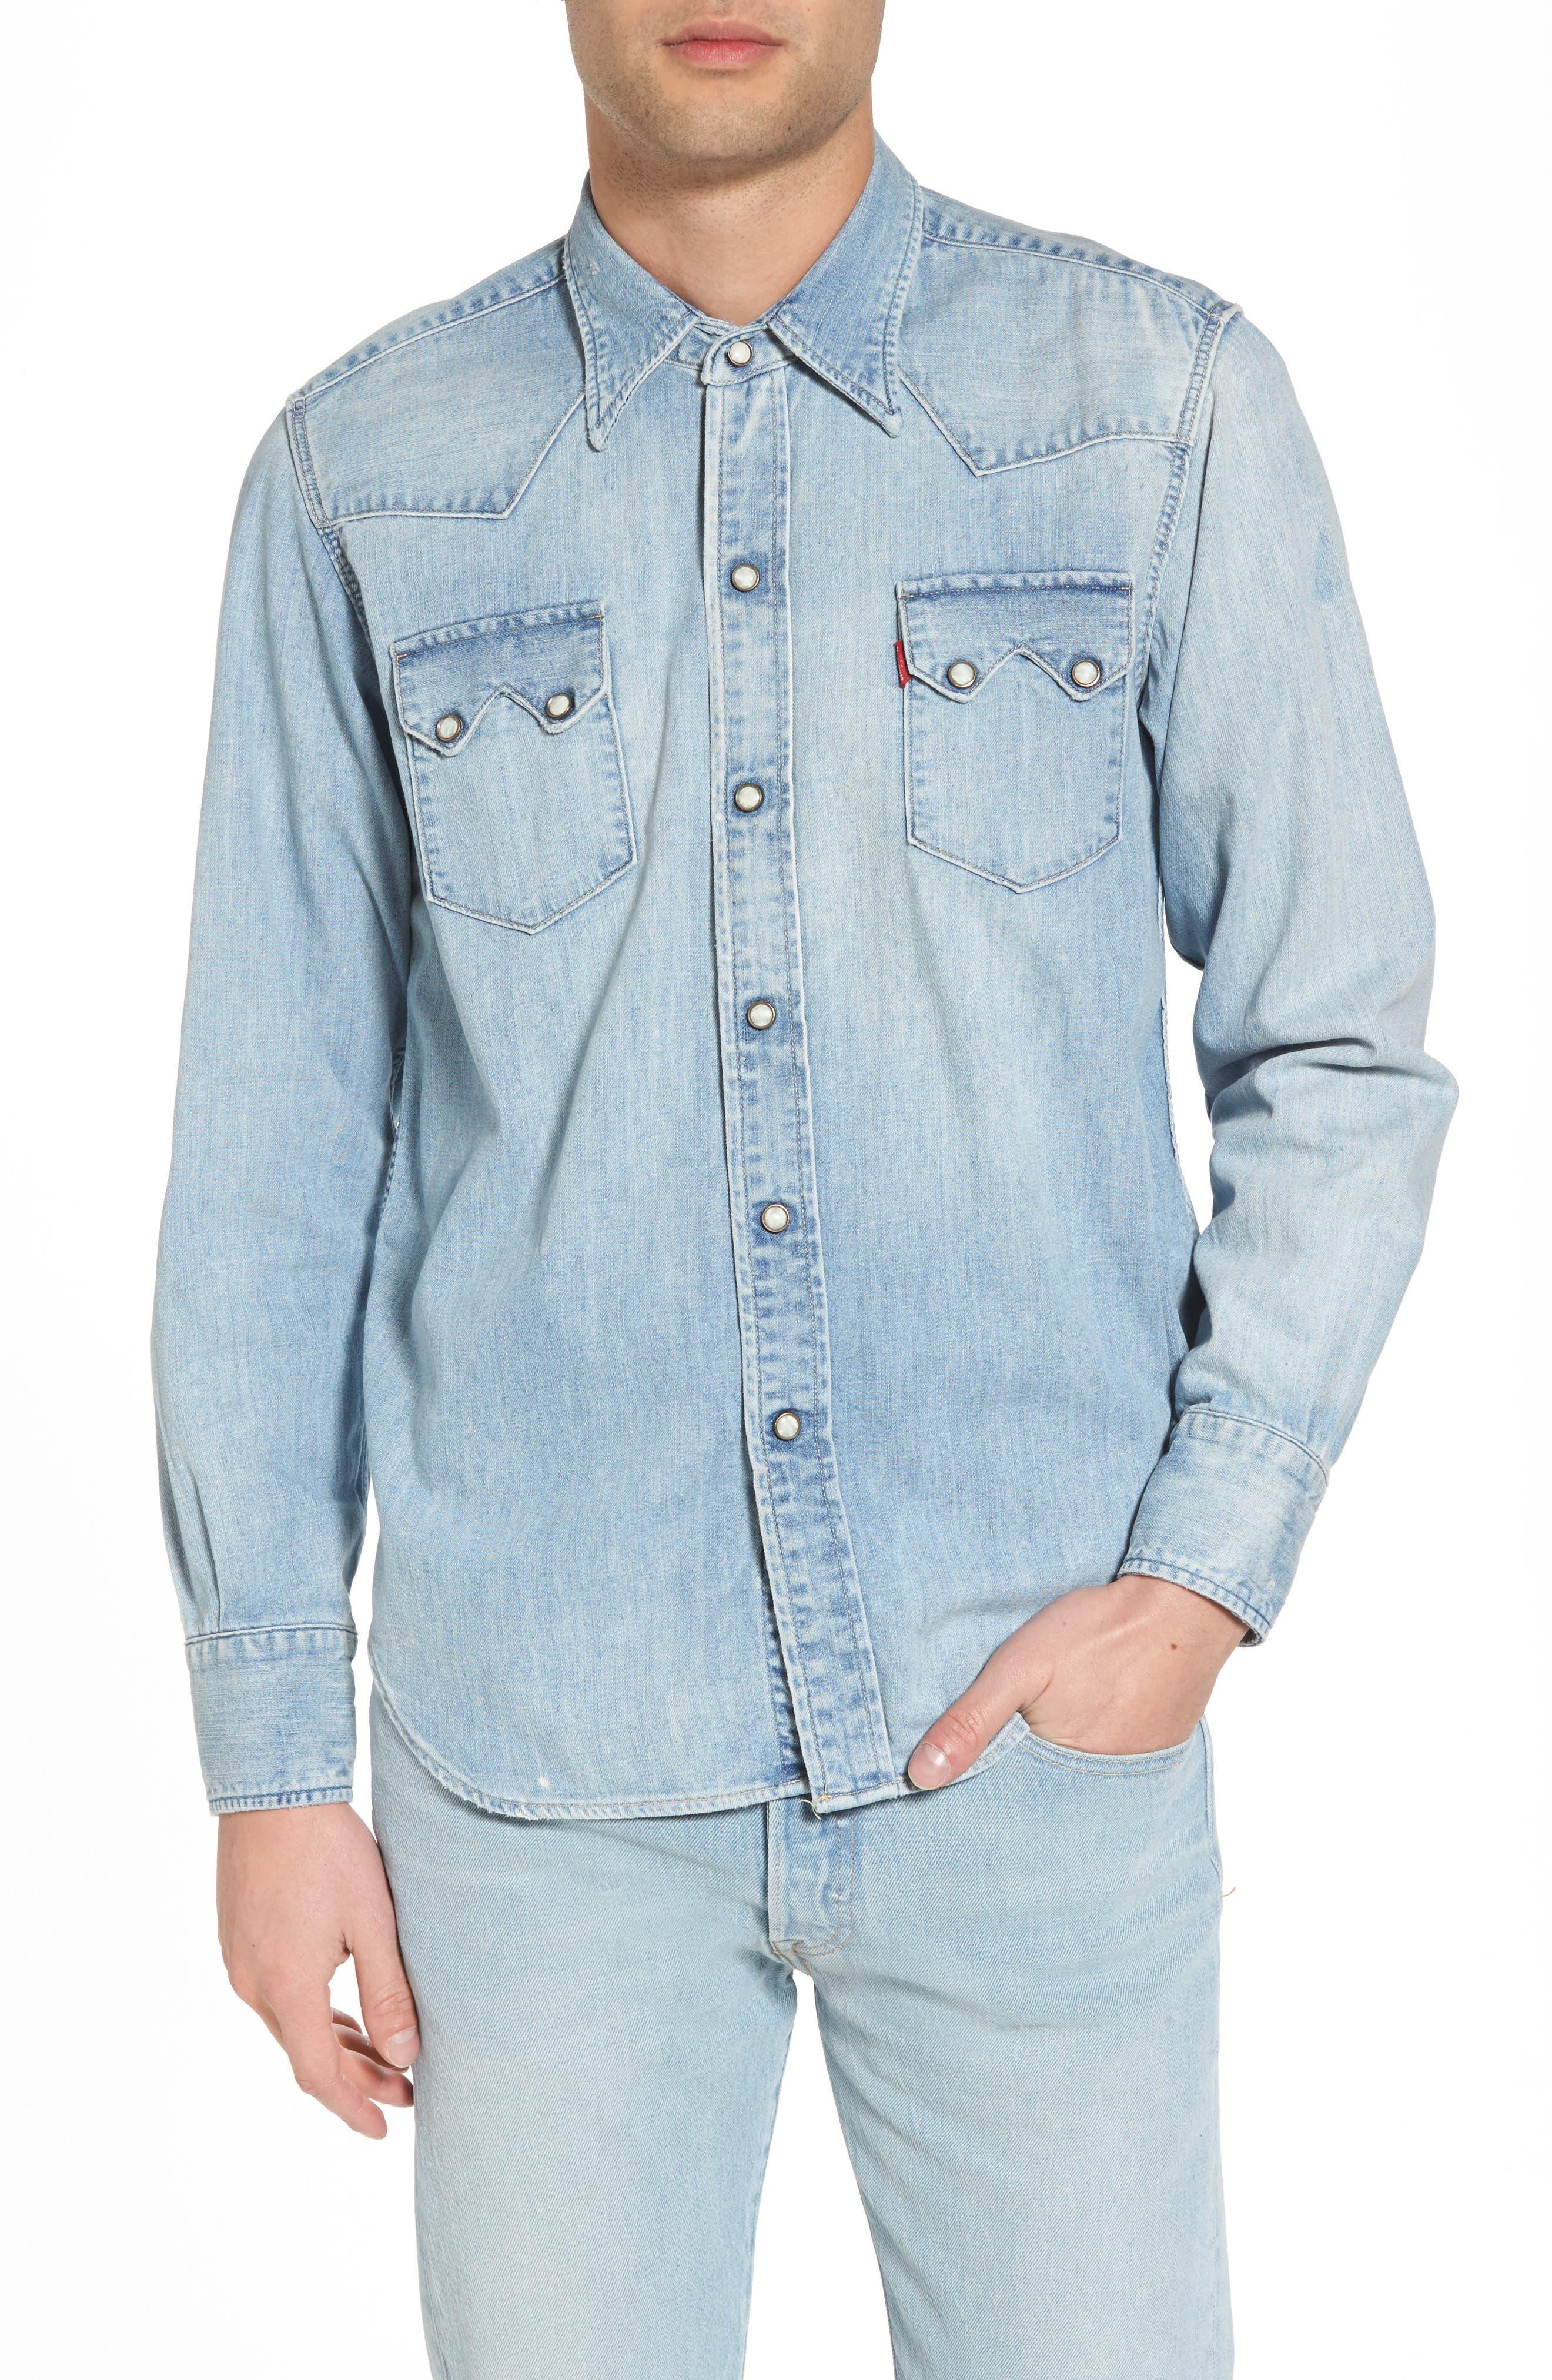 Levi's® Vintage Clothing 1955 Sawtooth Trim Fit Denim Western Shirt